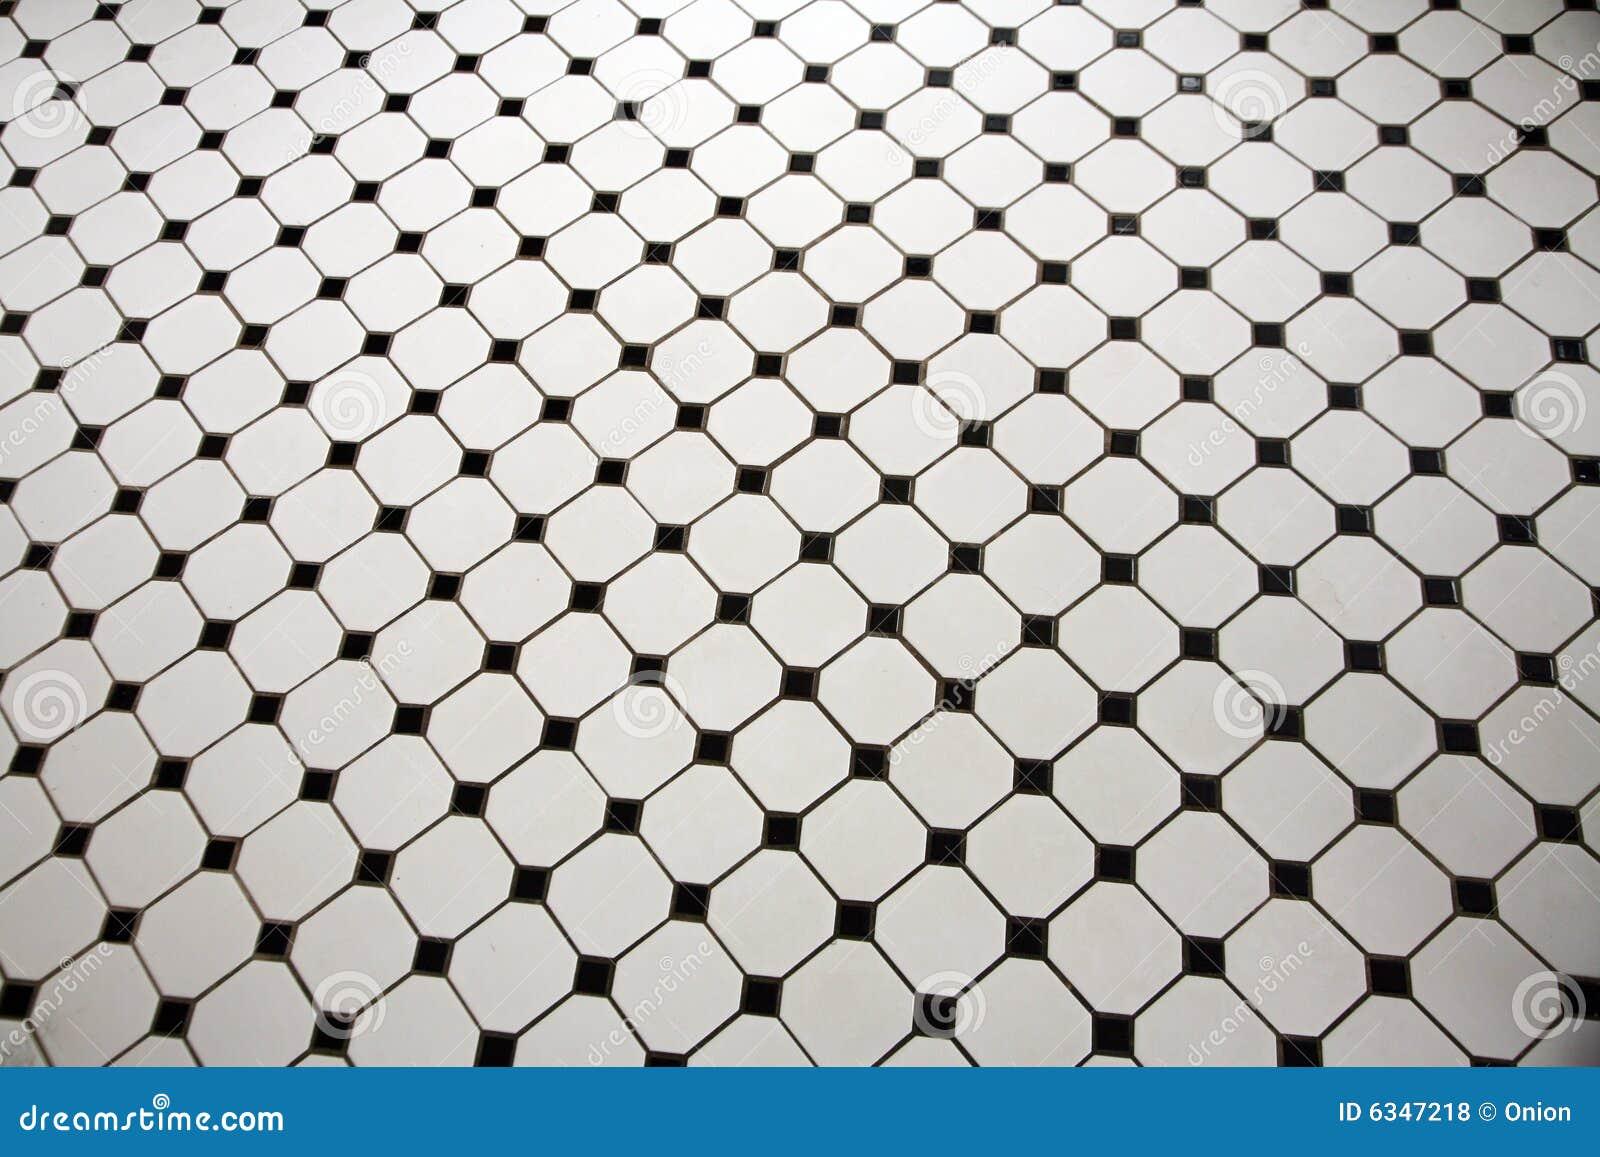 Black And White Tiled Floor Royalty Free Stock Photos Image 6347218. Black And White Tiled Floor  White Black Basketweave Mosaic Tiles